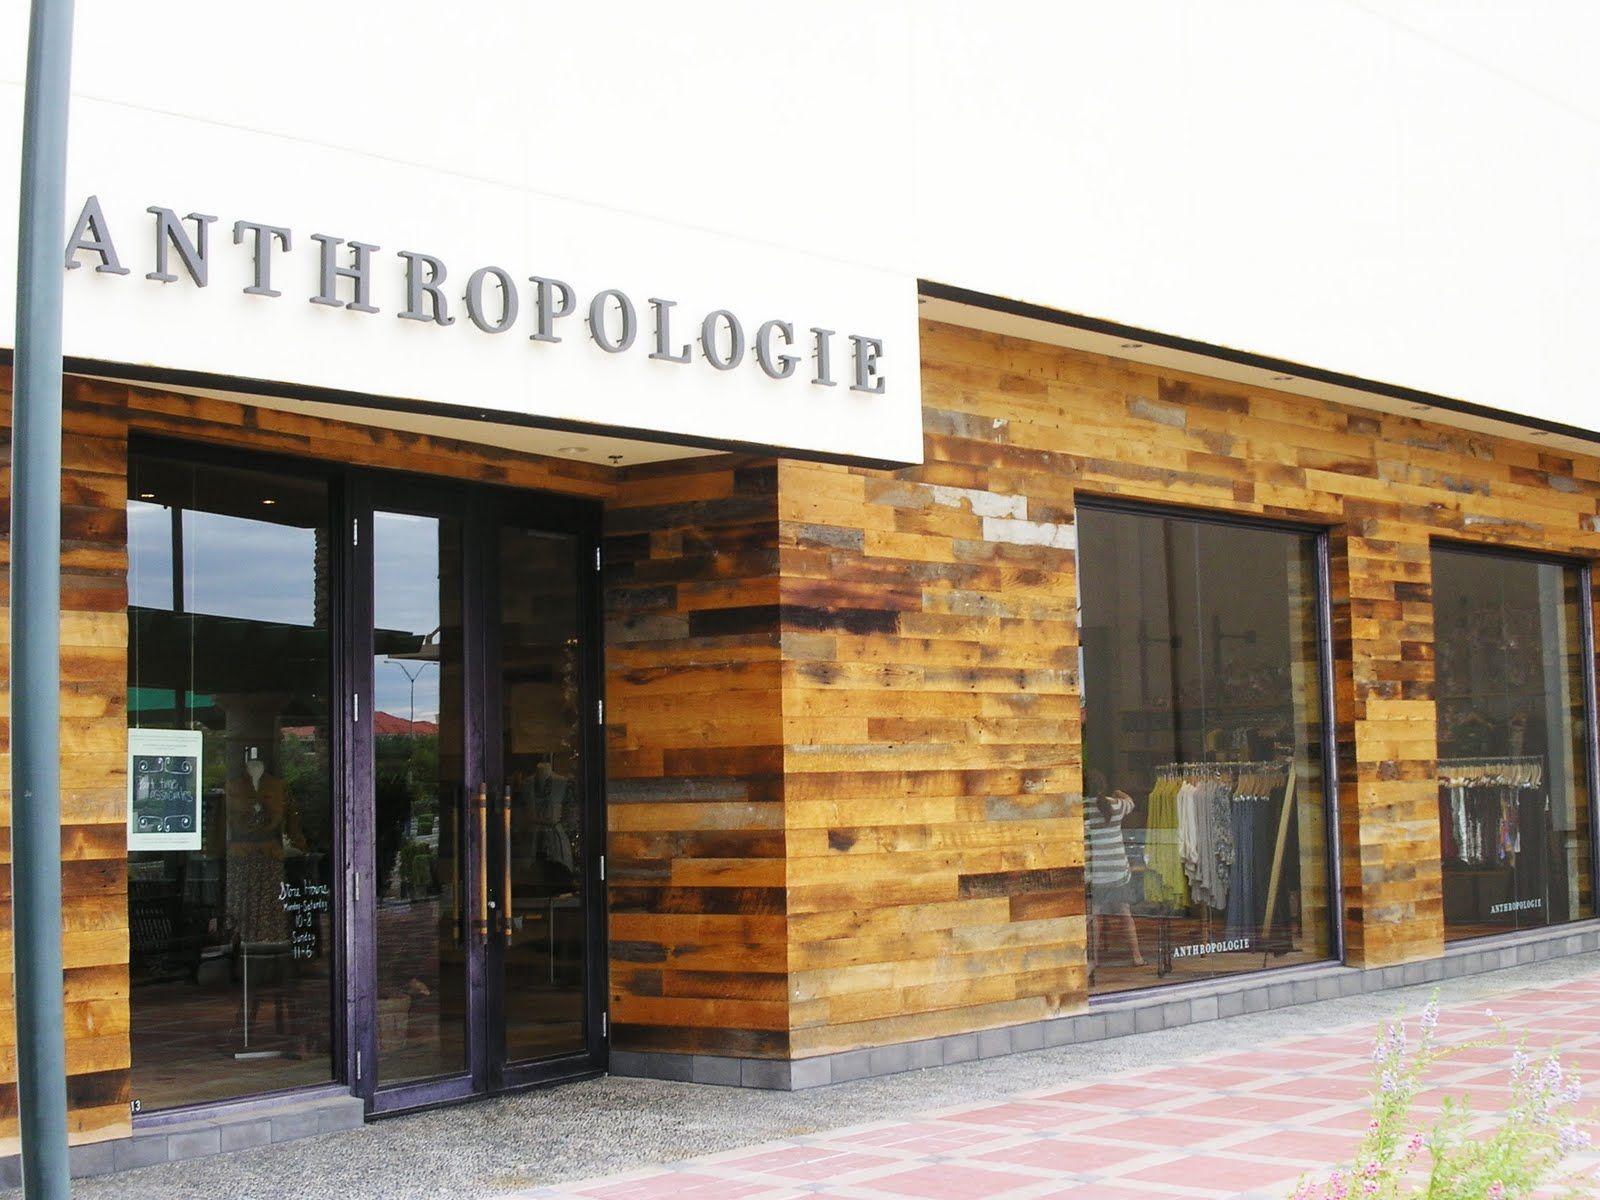 anthropologie store exterior google search office ideas shop front design shop fronts. Black Bedroom Furniture Sets. Home Design Ideas